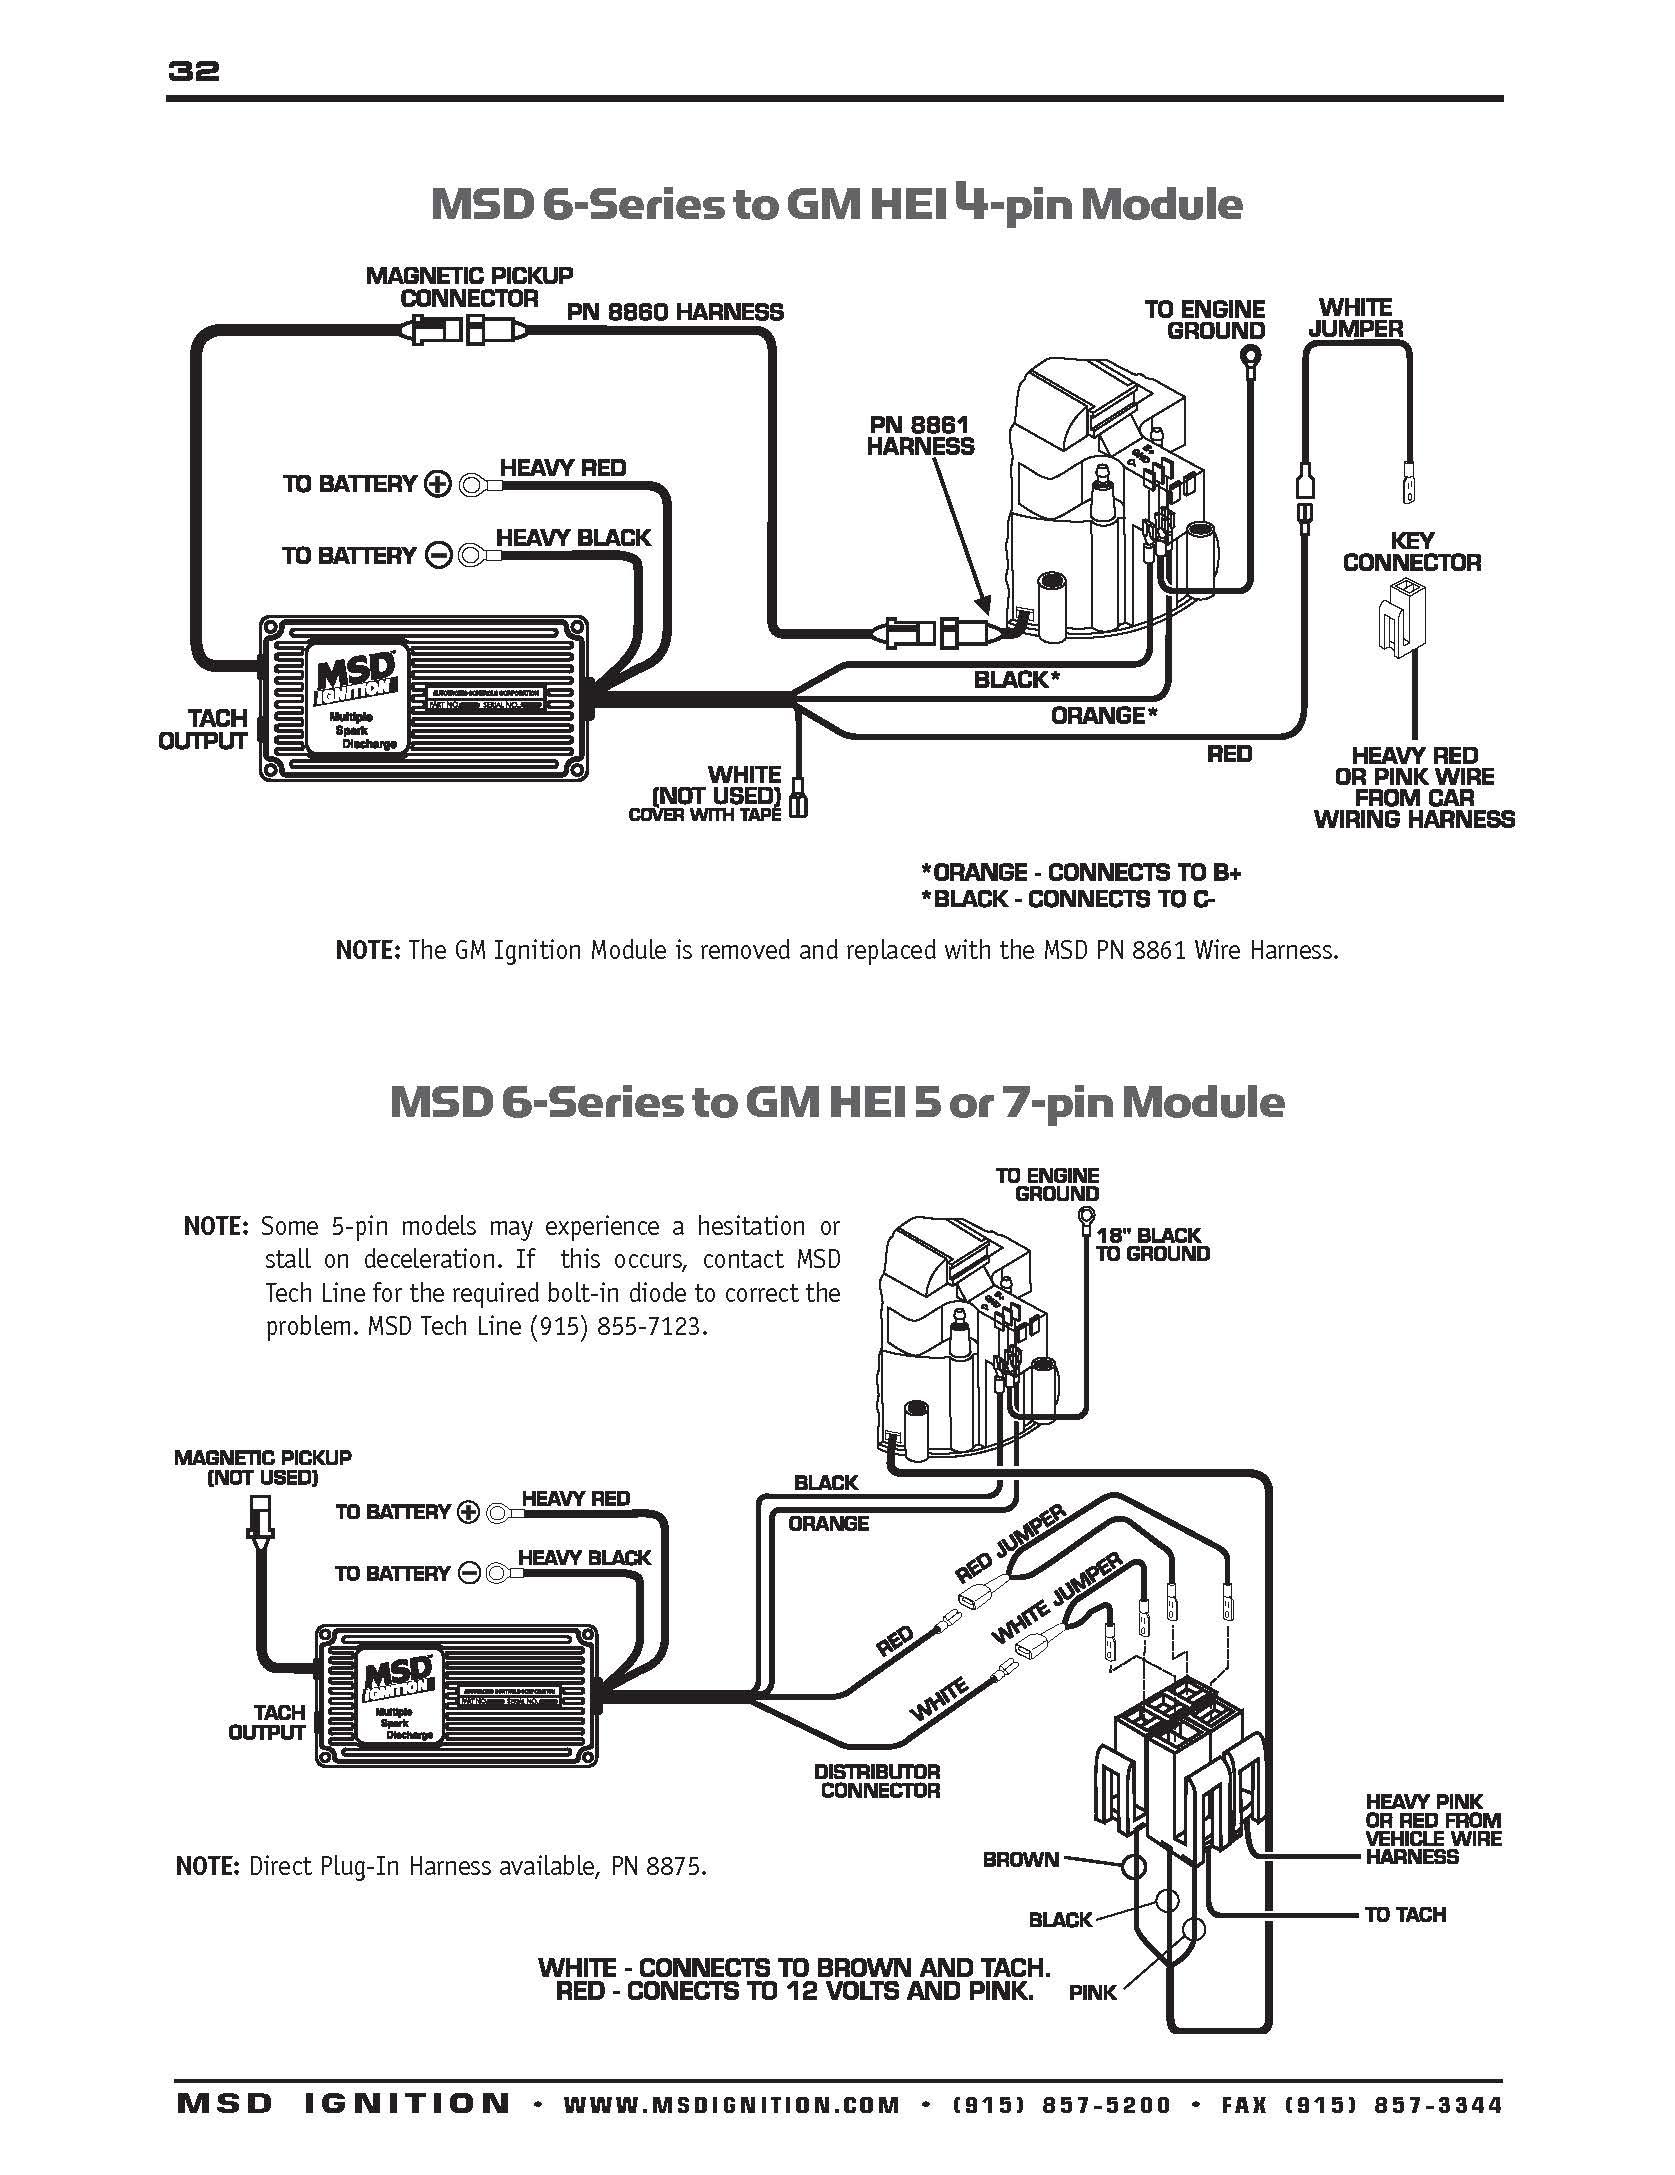 t6 msd wiring diagram wiring diagram m6 msd 7al 2 wiring tachometer wiring diagram m6 msd 3 wire schematic schematic wiring diagram msd